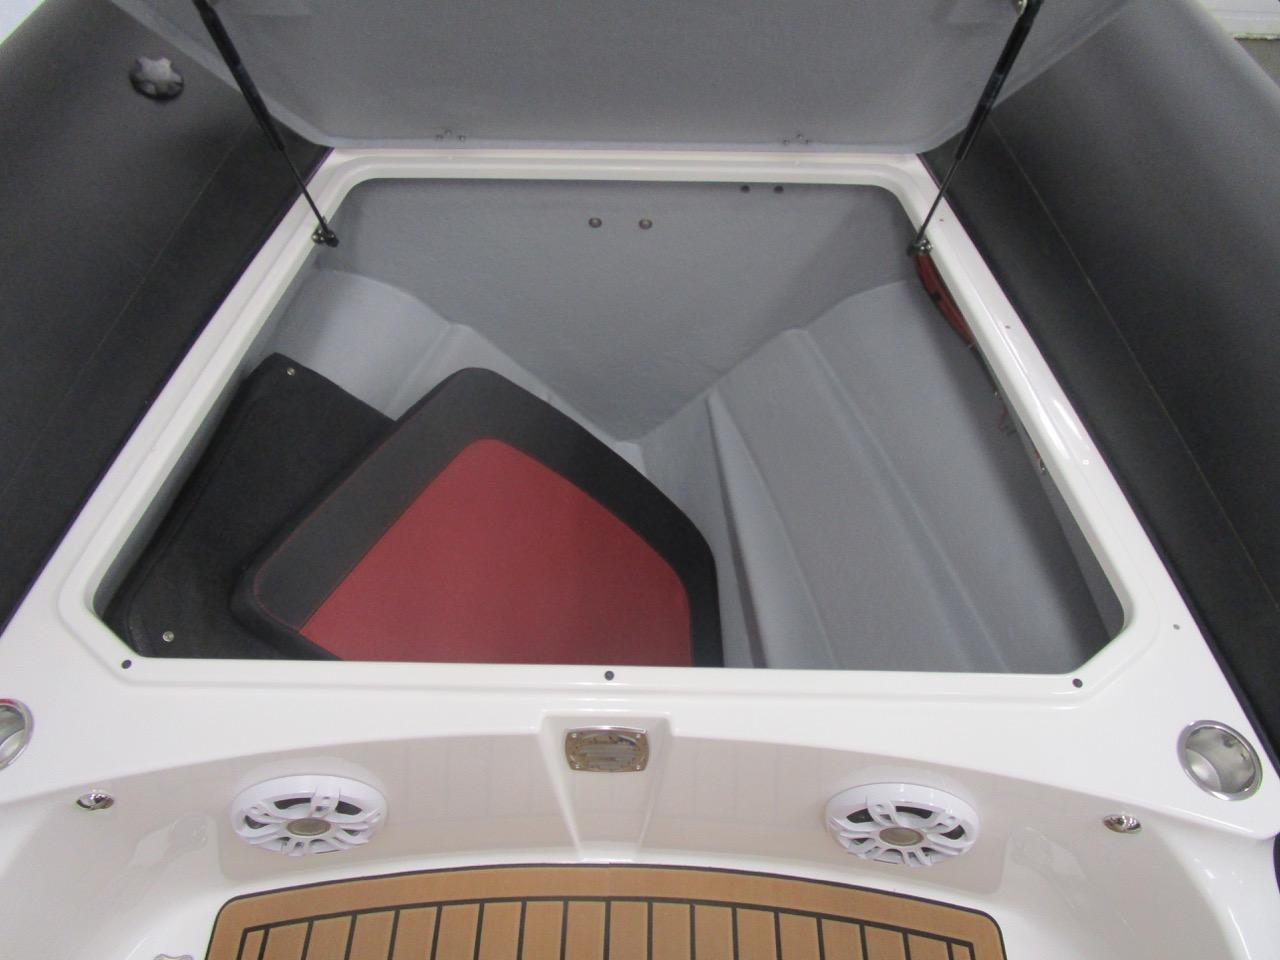 GRAND G850 RIB bow locker with sundeck cushions inside